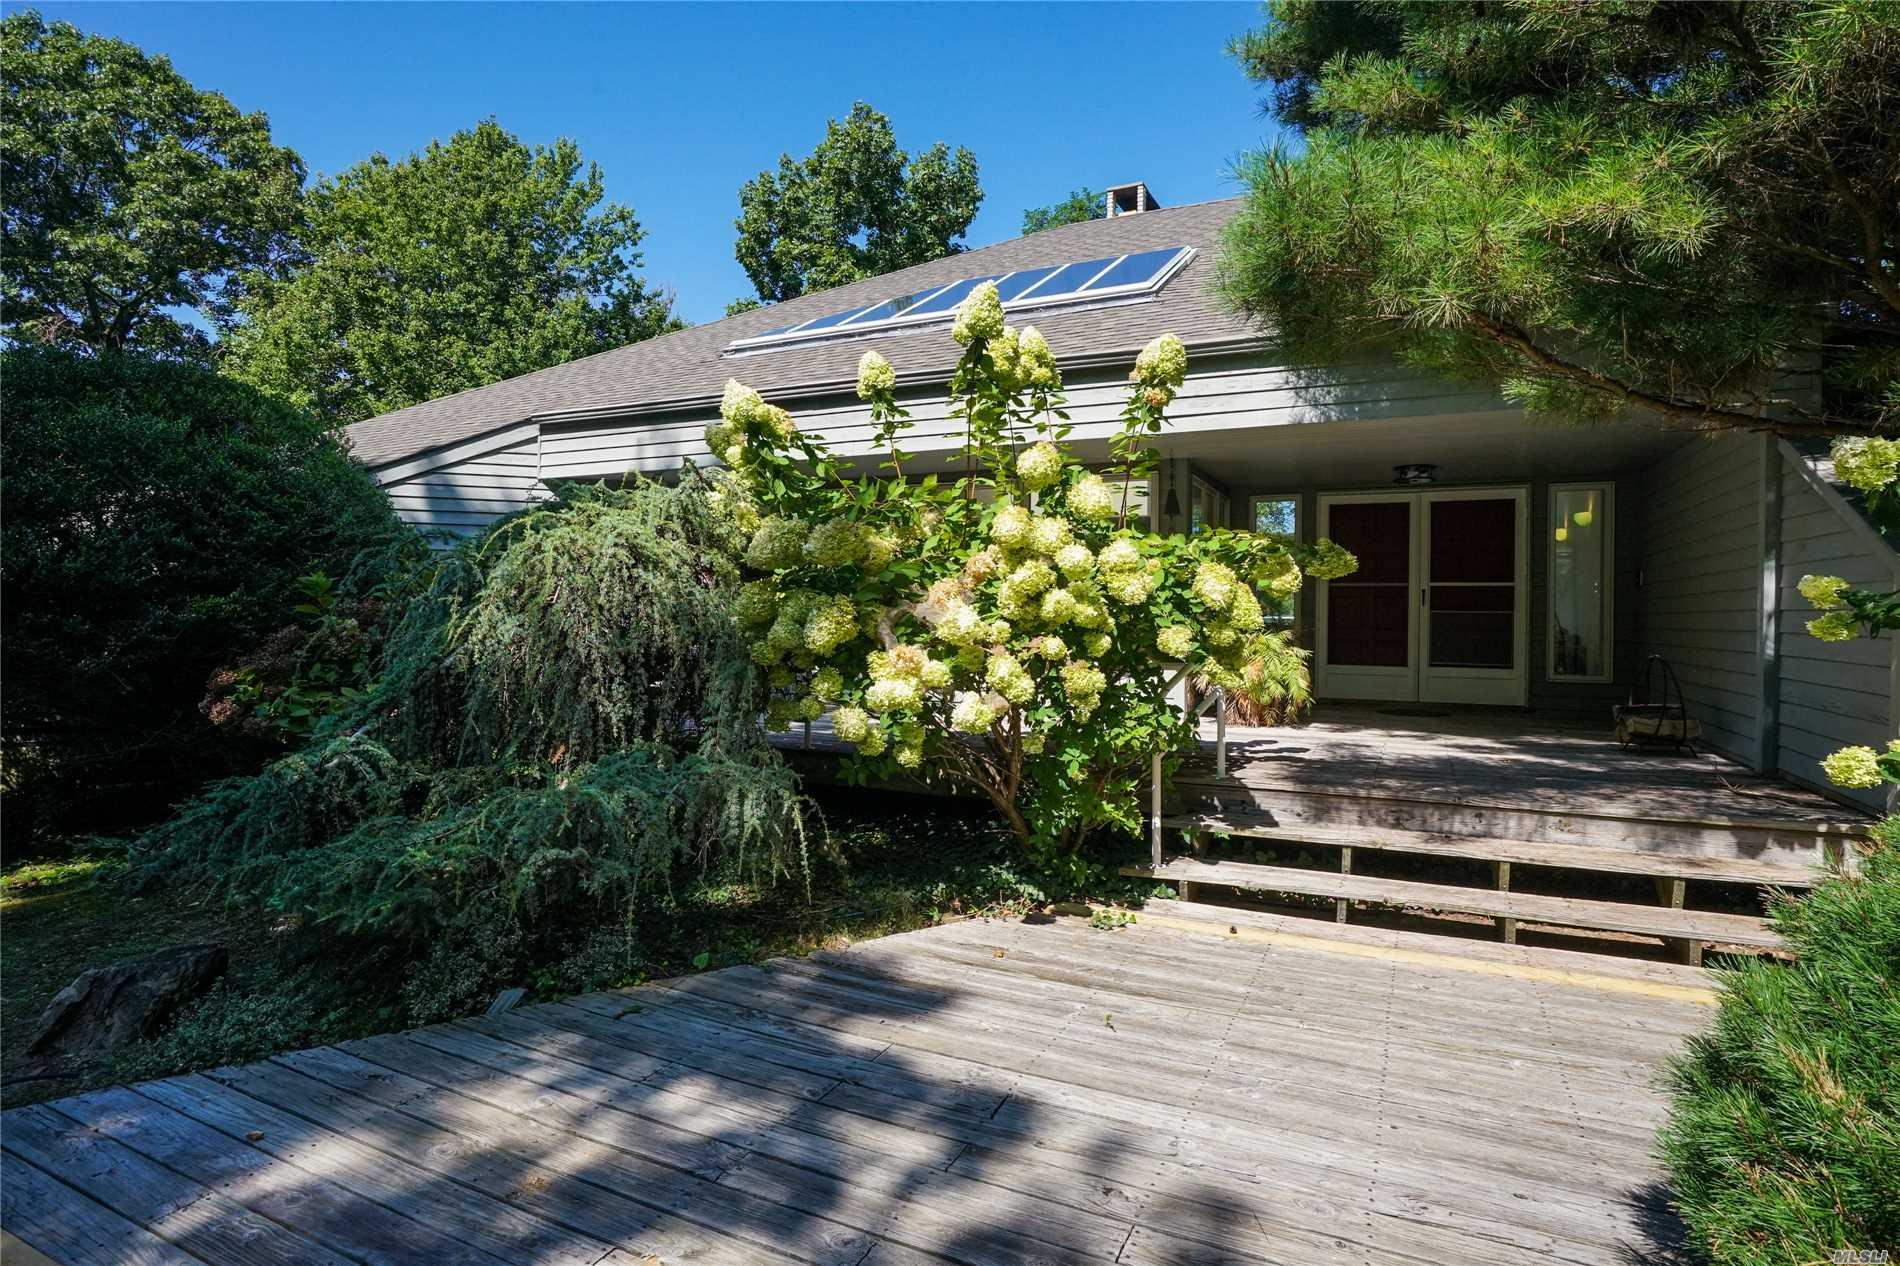 Photo of home for sale at 20 Evans Ln, Setauket NY